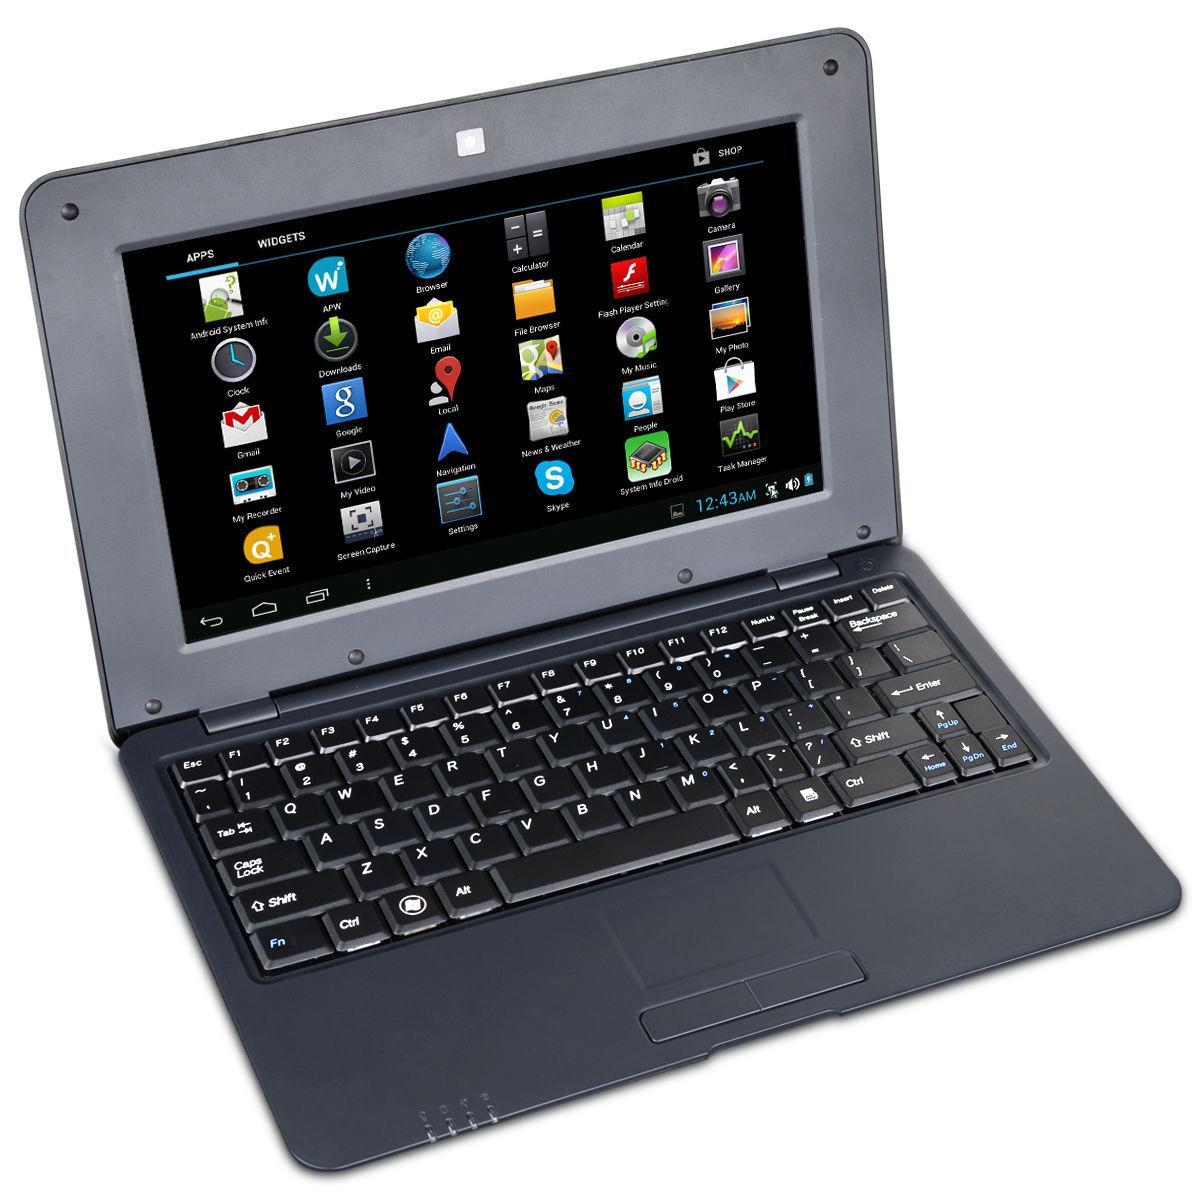 Buy Vox Laptop Online At Best Price In India On Naaptol Com